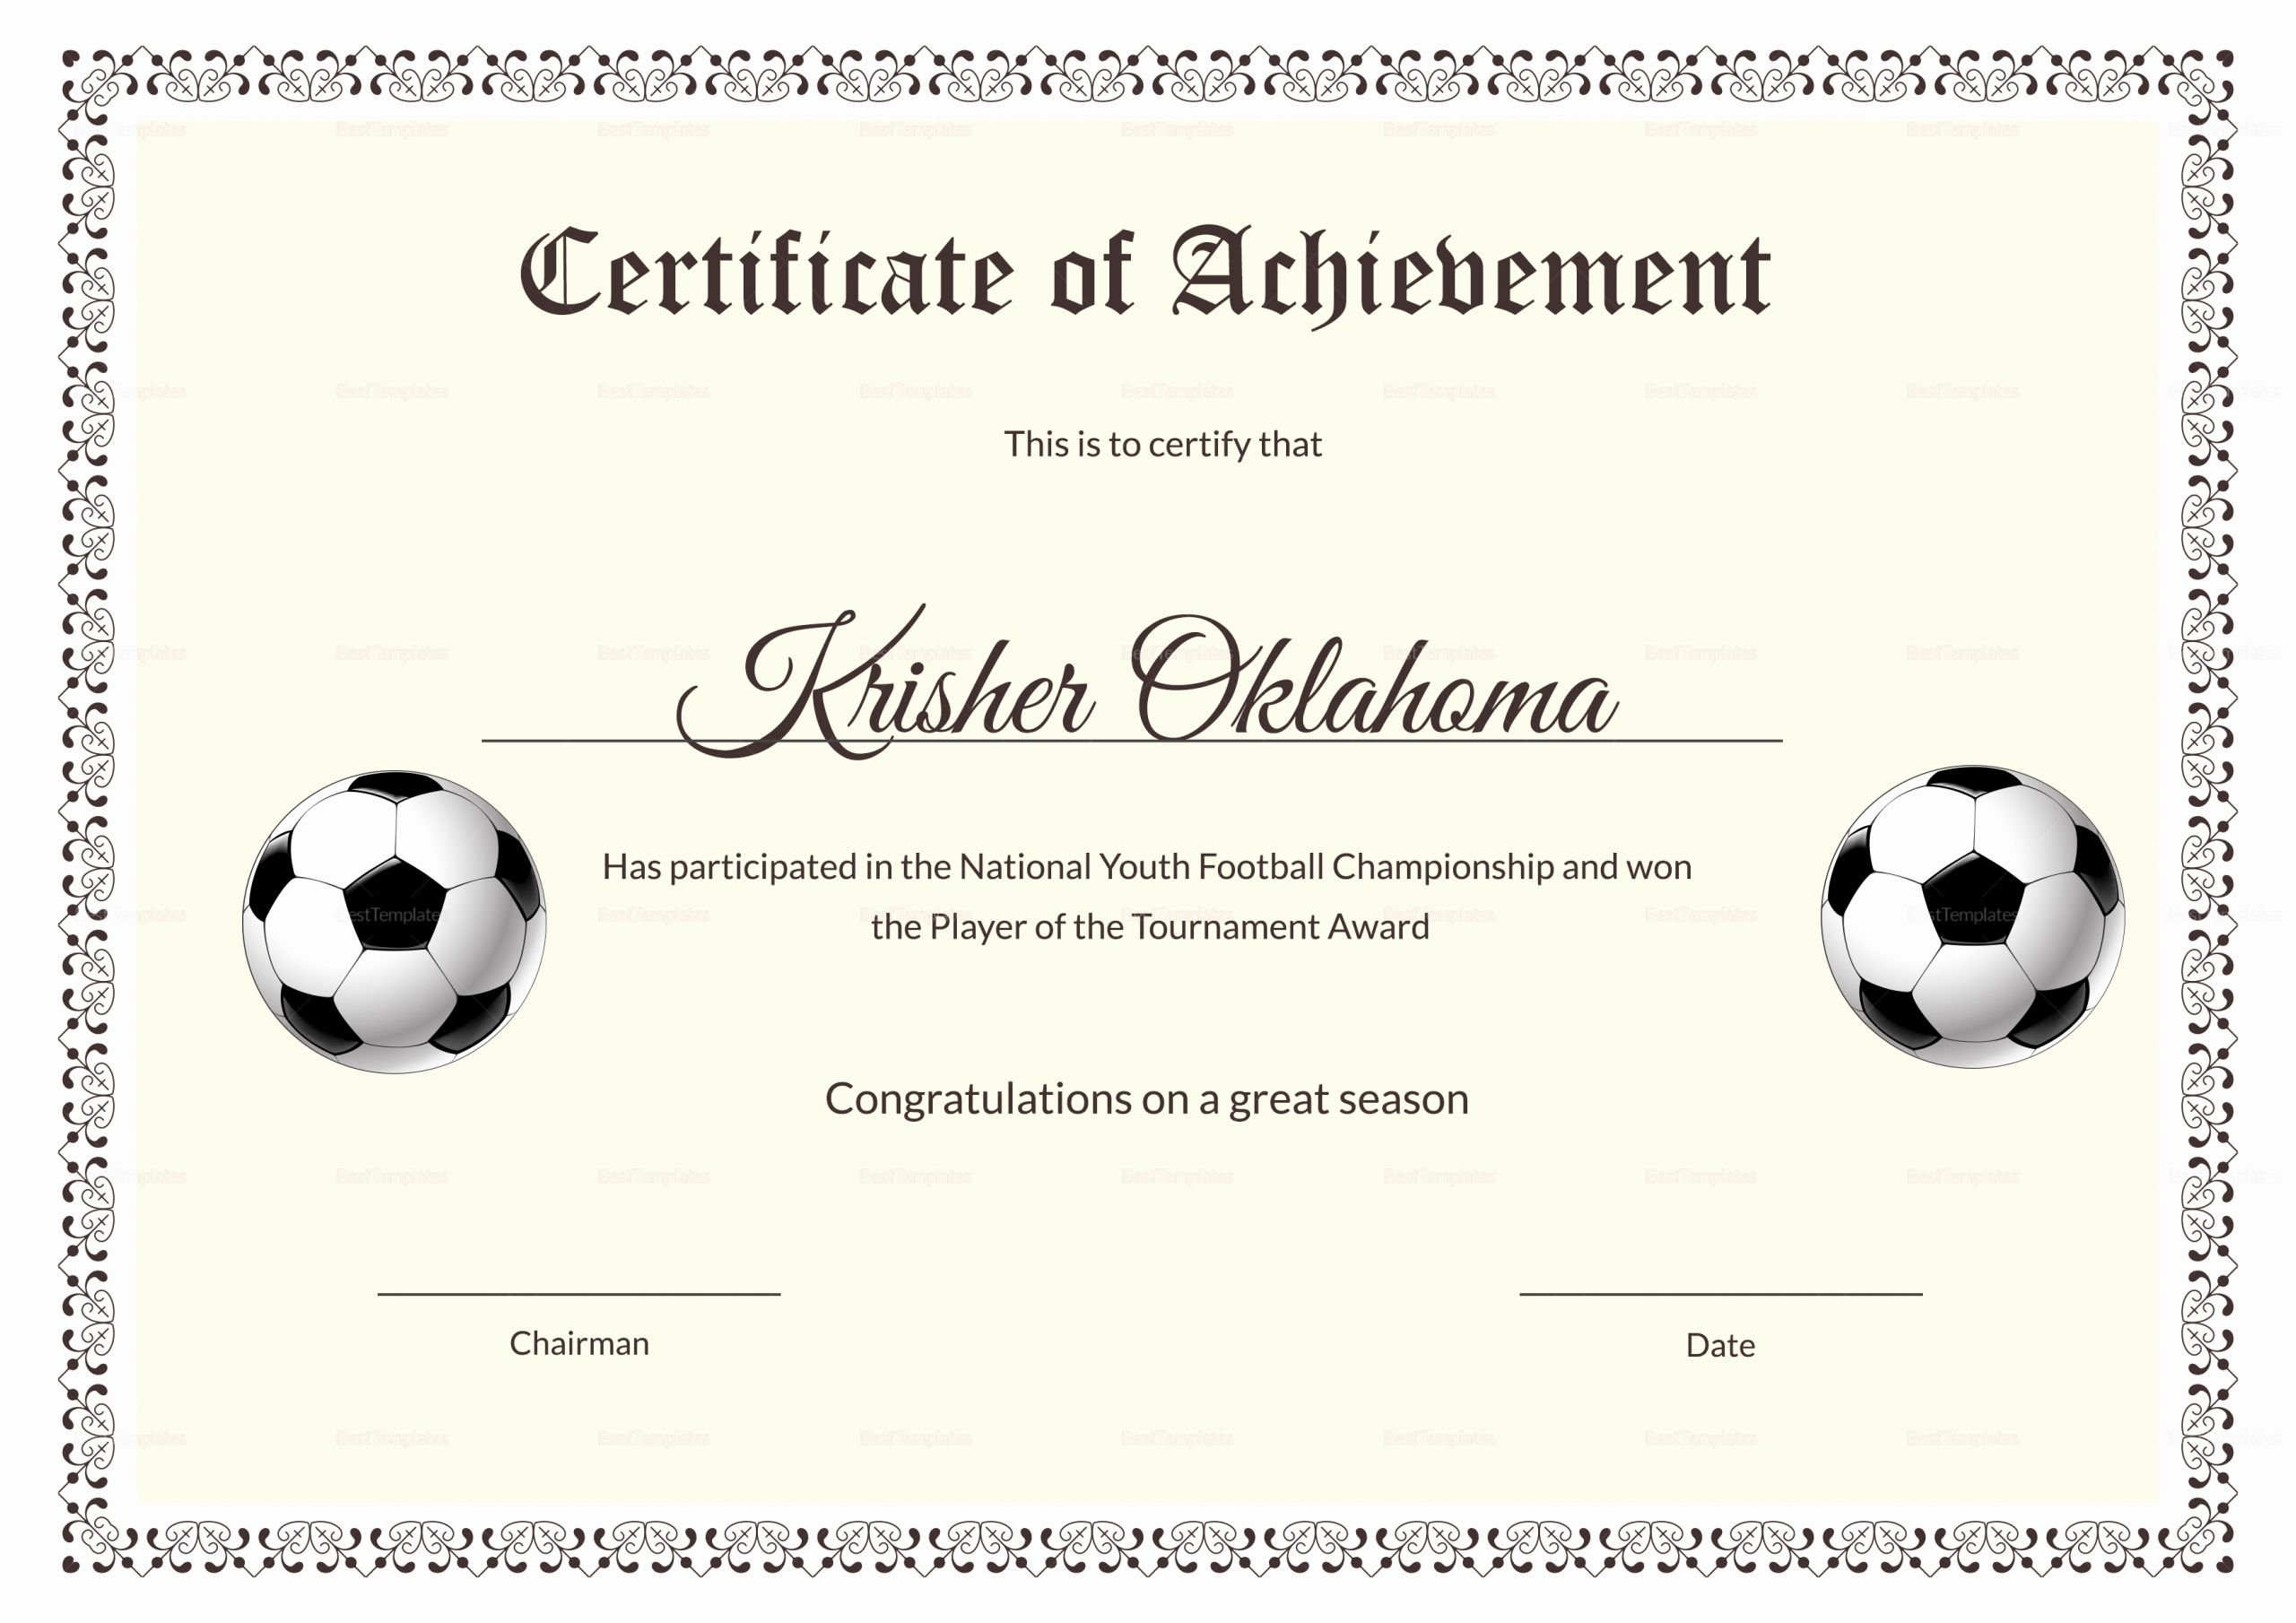 Free Football Certificates Templates New National Youth Football Certificate Design Template In Psd